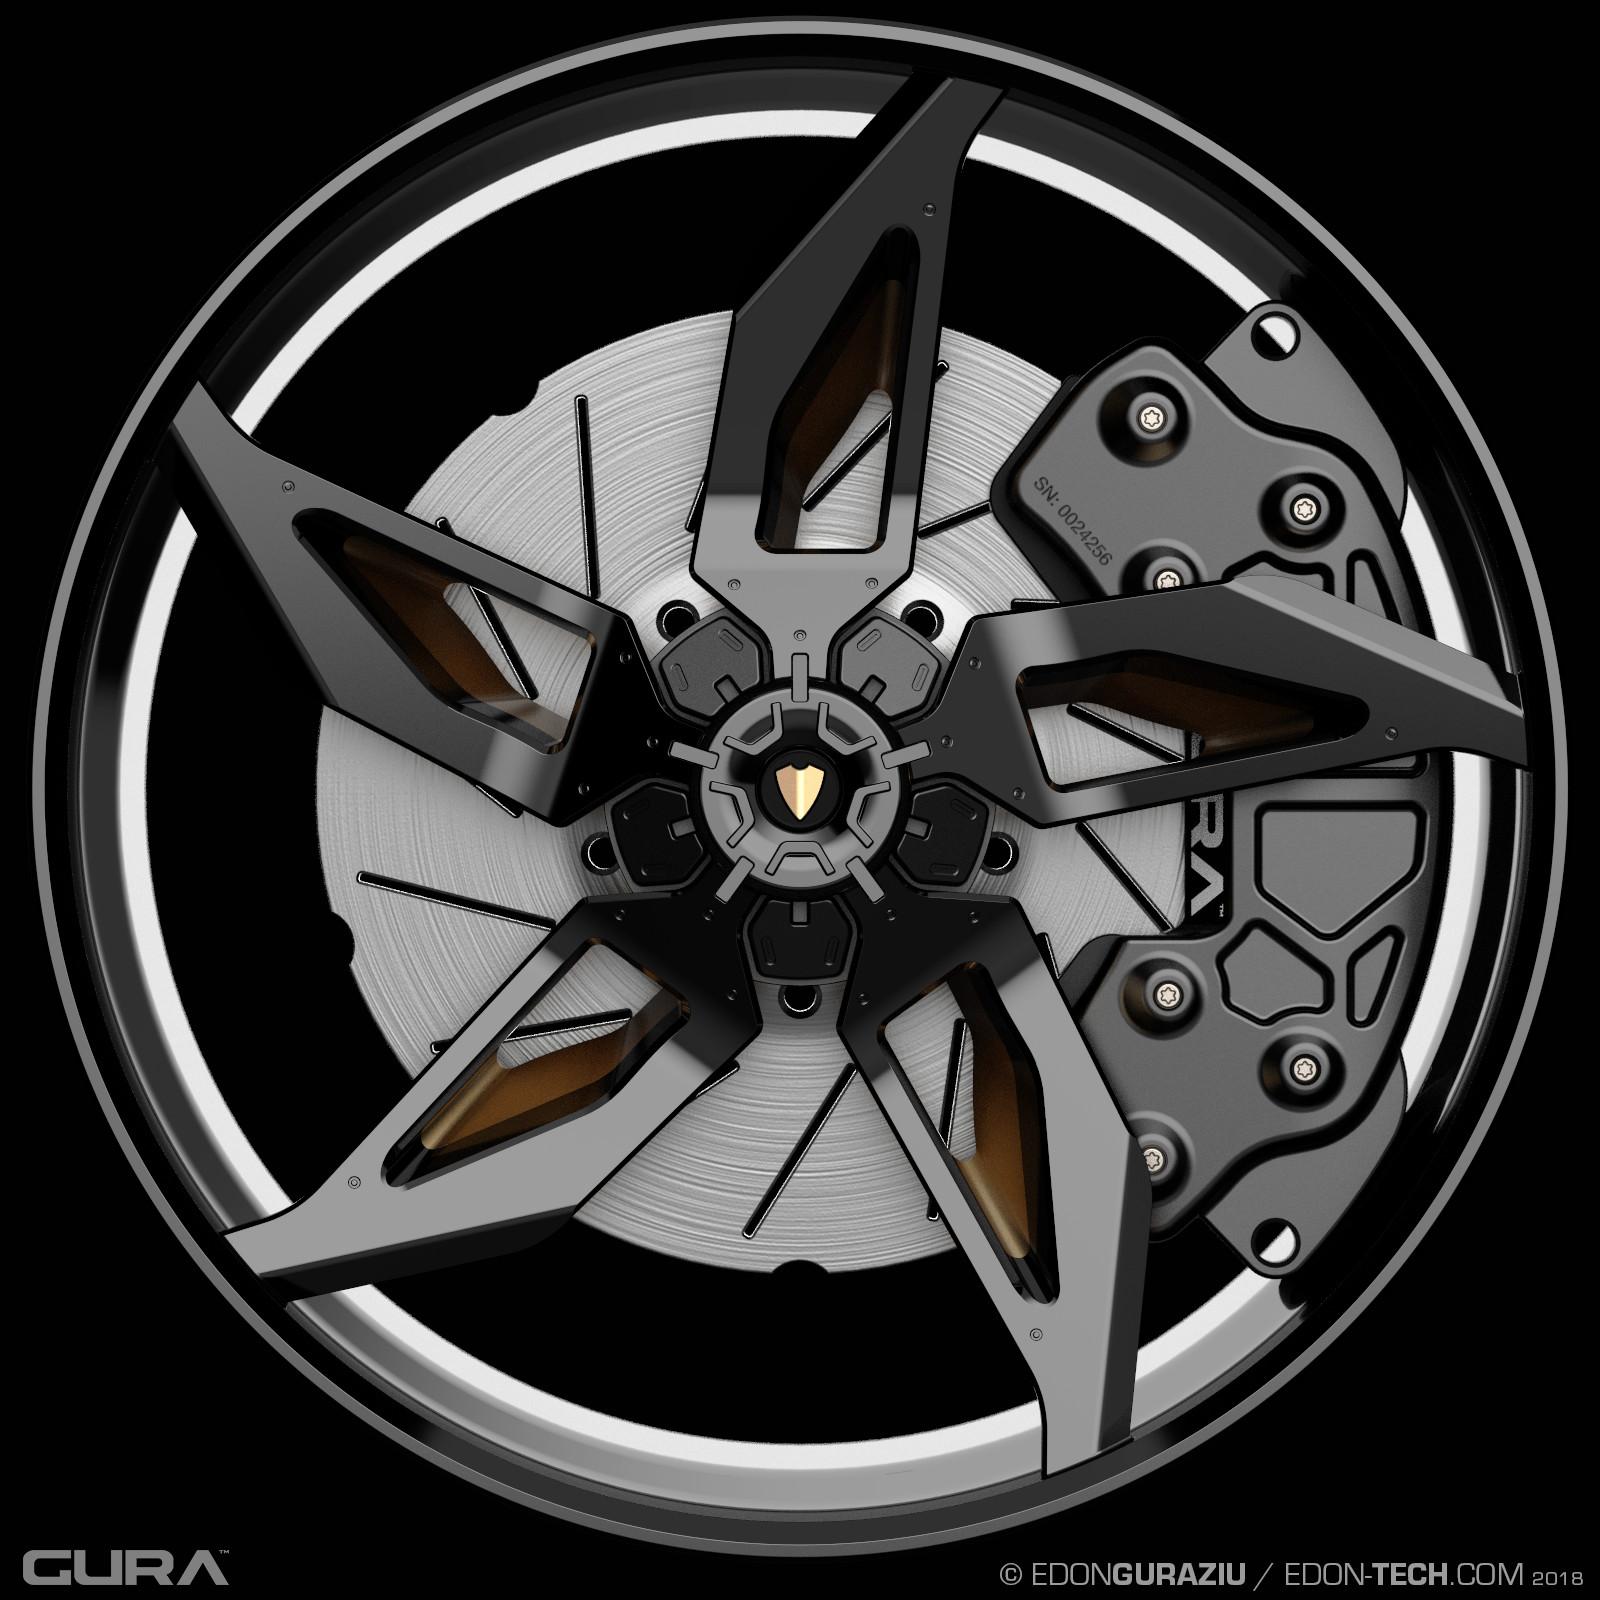 Edon guraziu gura black wheel 003